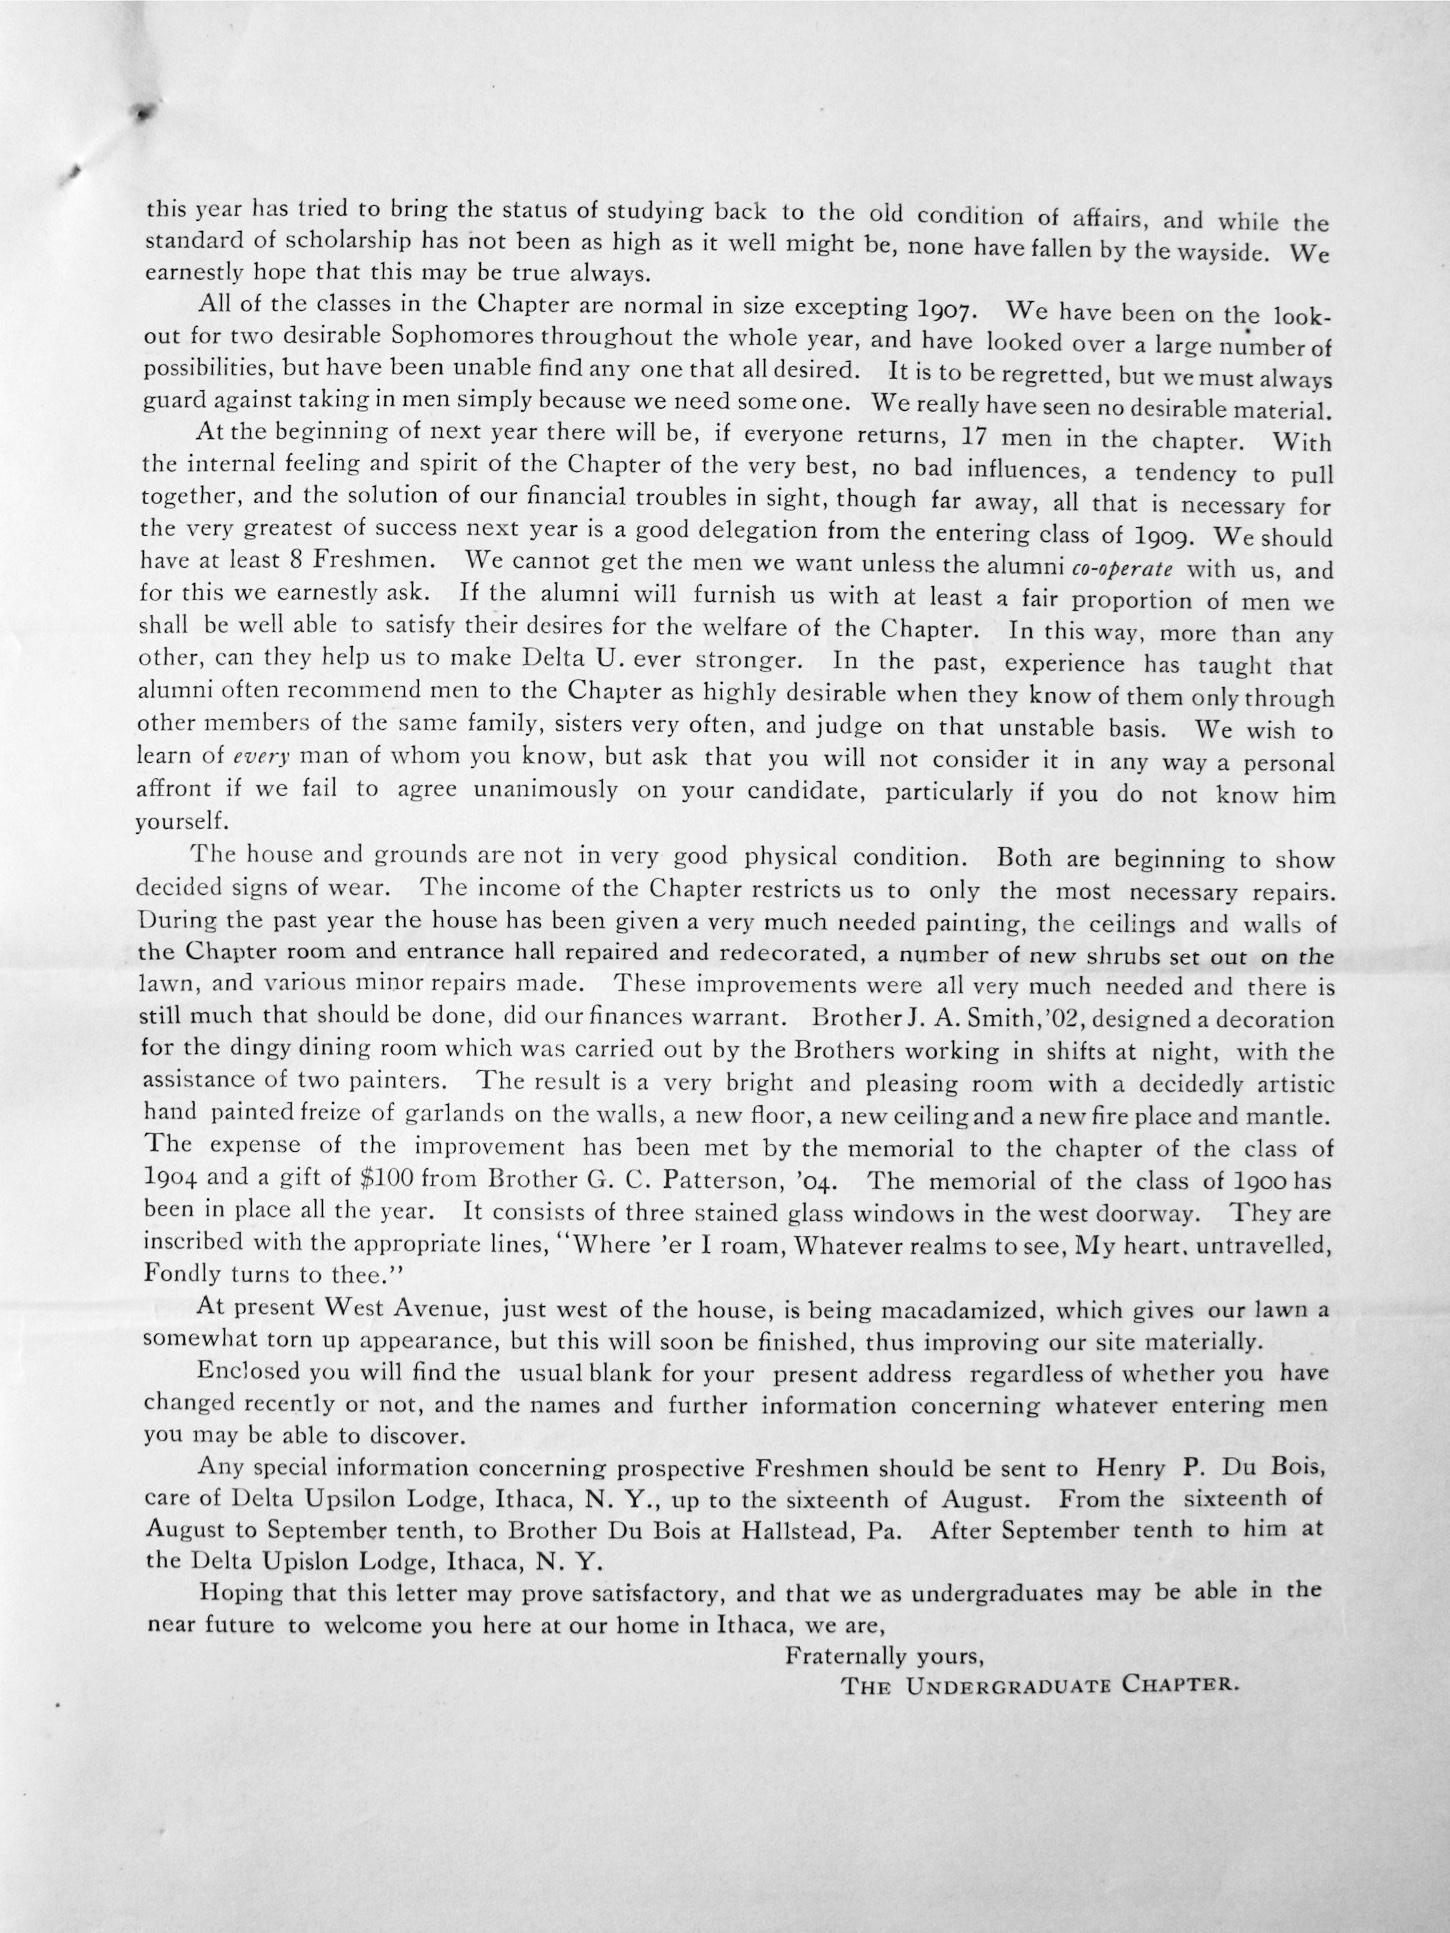 Alumni Circular 1905, P. 3